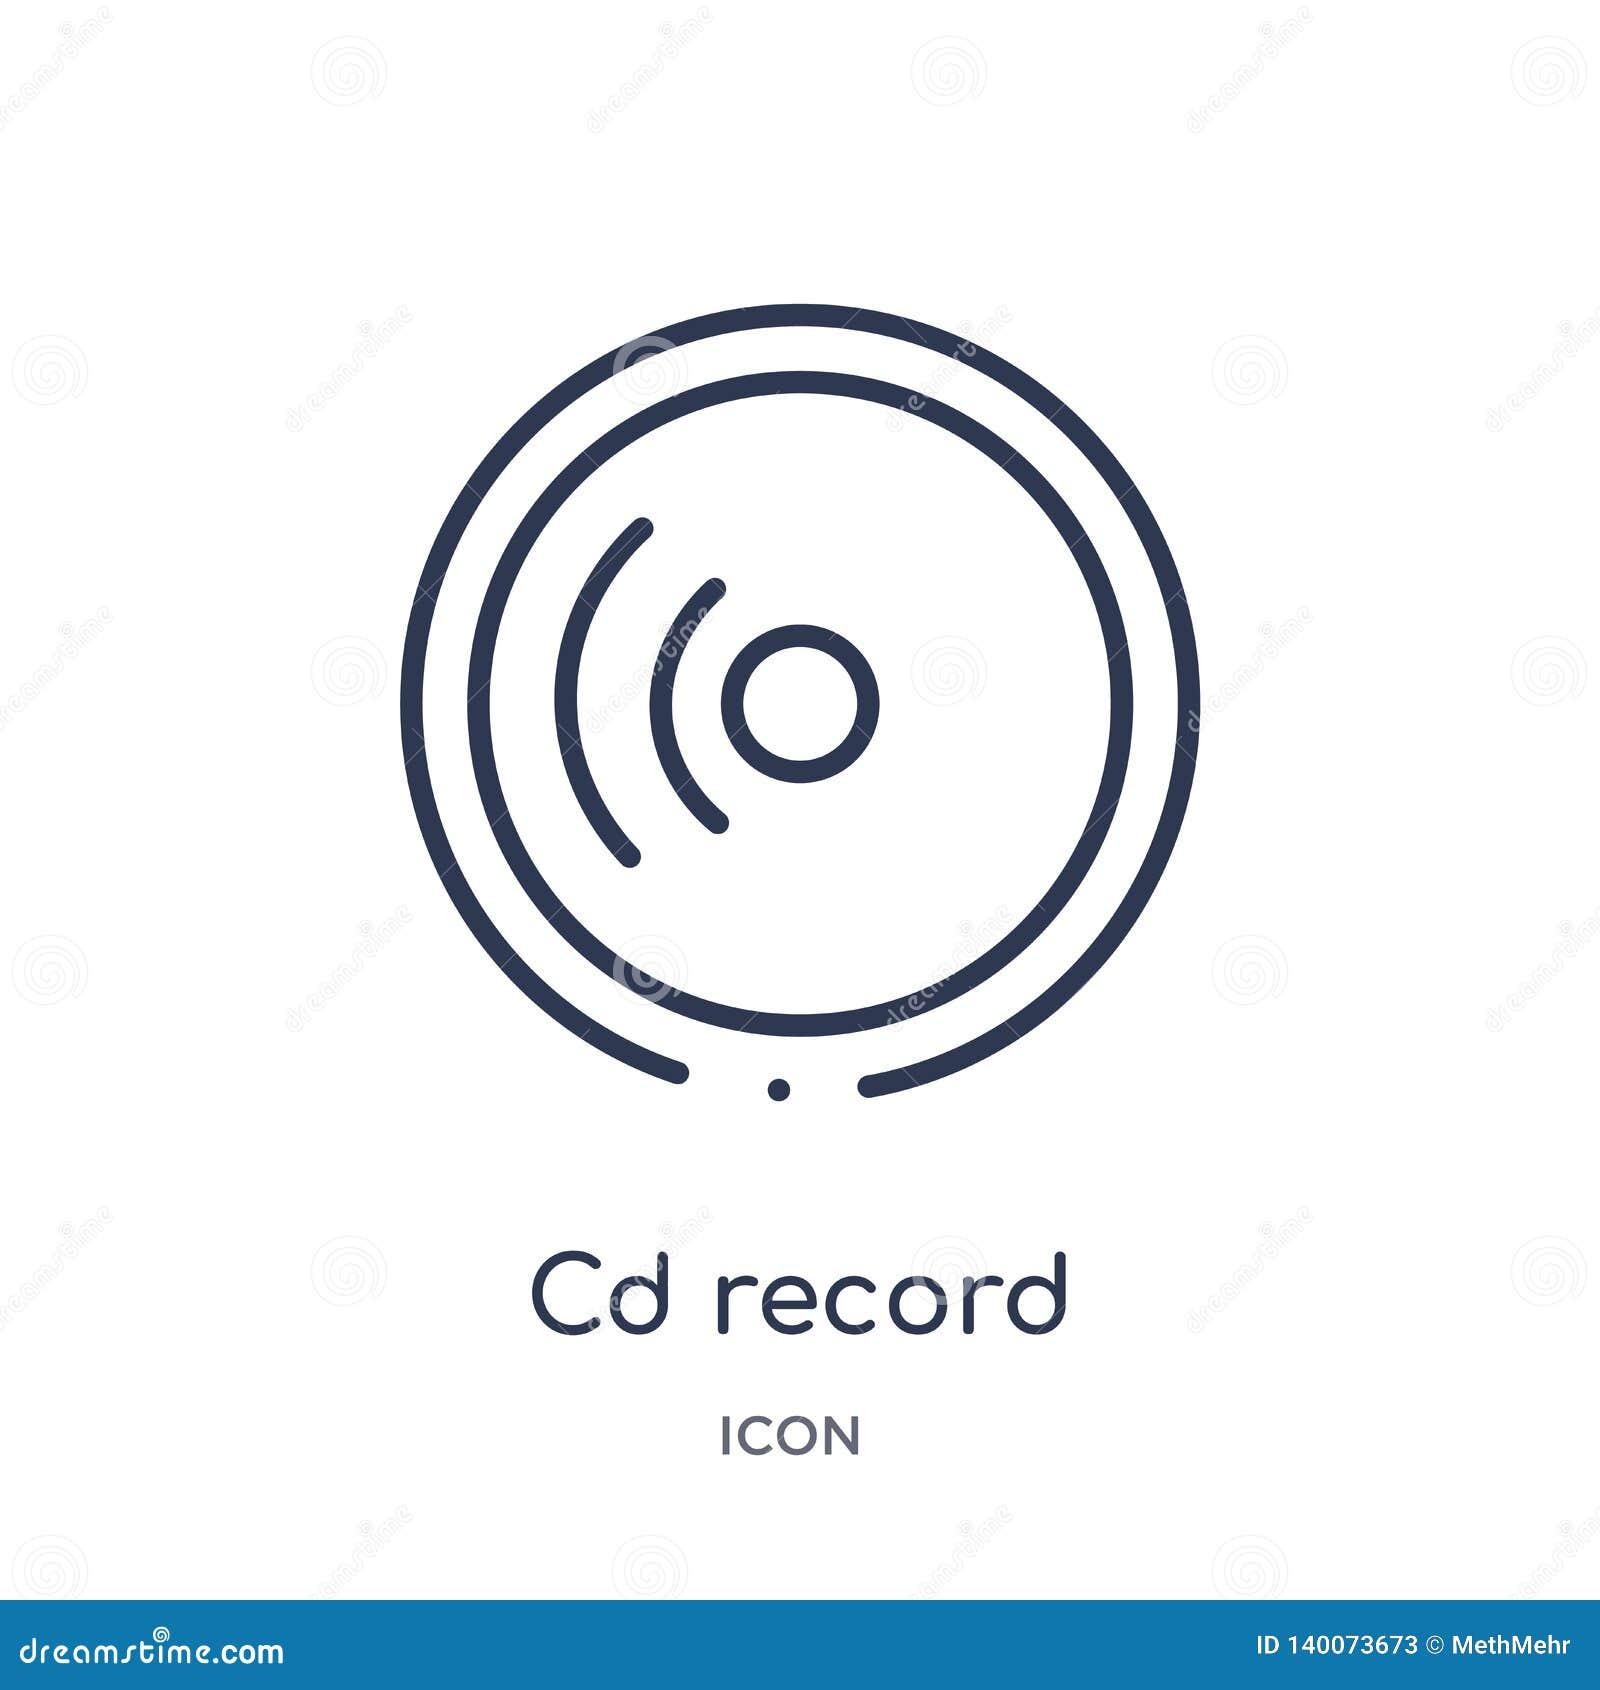 Lineair CD-verslagpictogram van Algemene overzichtsinzameling Dun die het verslagpictogram van lijncd op witte achtergrond wordt